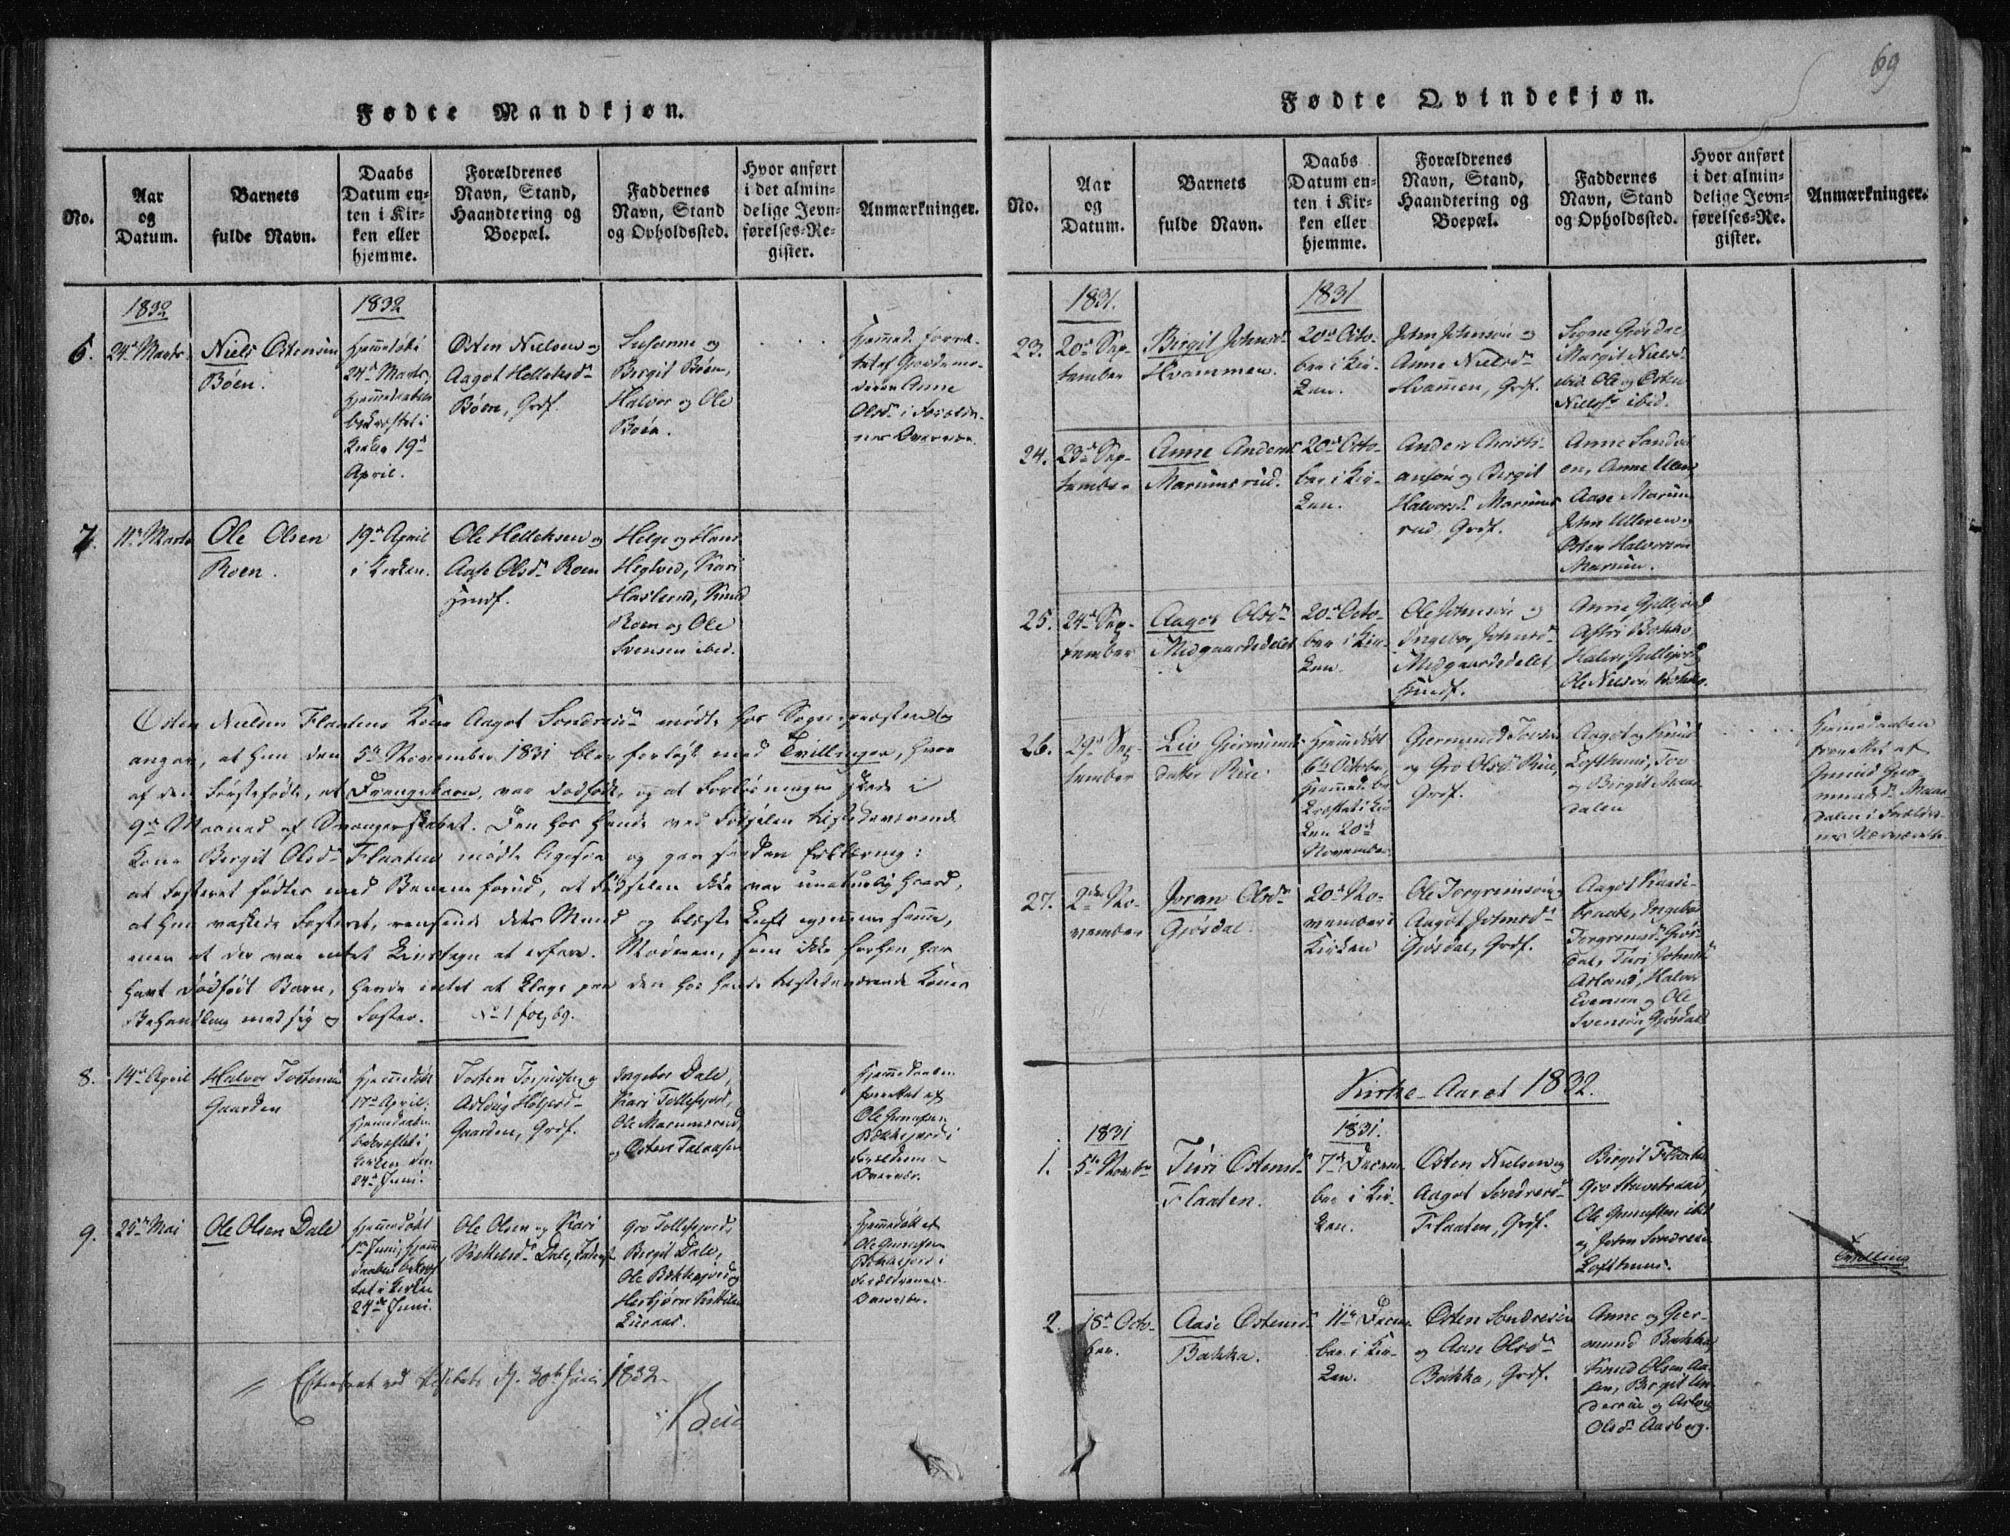 SAKO, Tinn kirkebøker, F/Fa/L0004: Ministerialbok nr. I 4, 1815-1843, s. 69